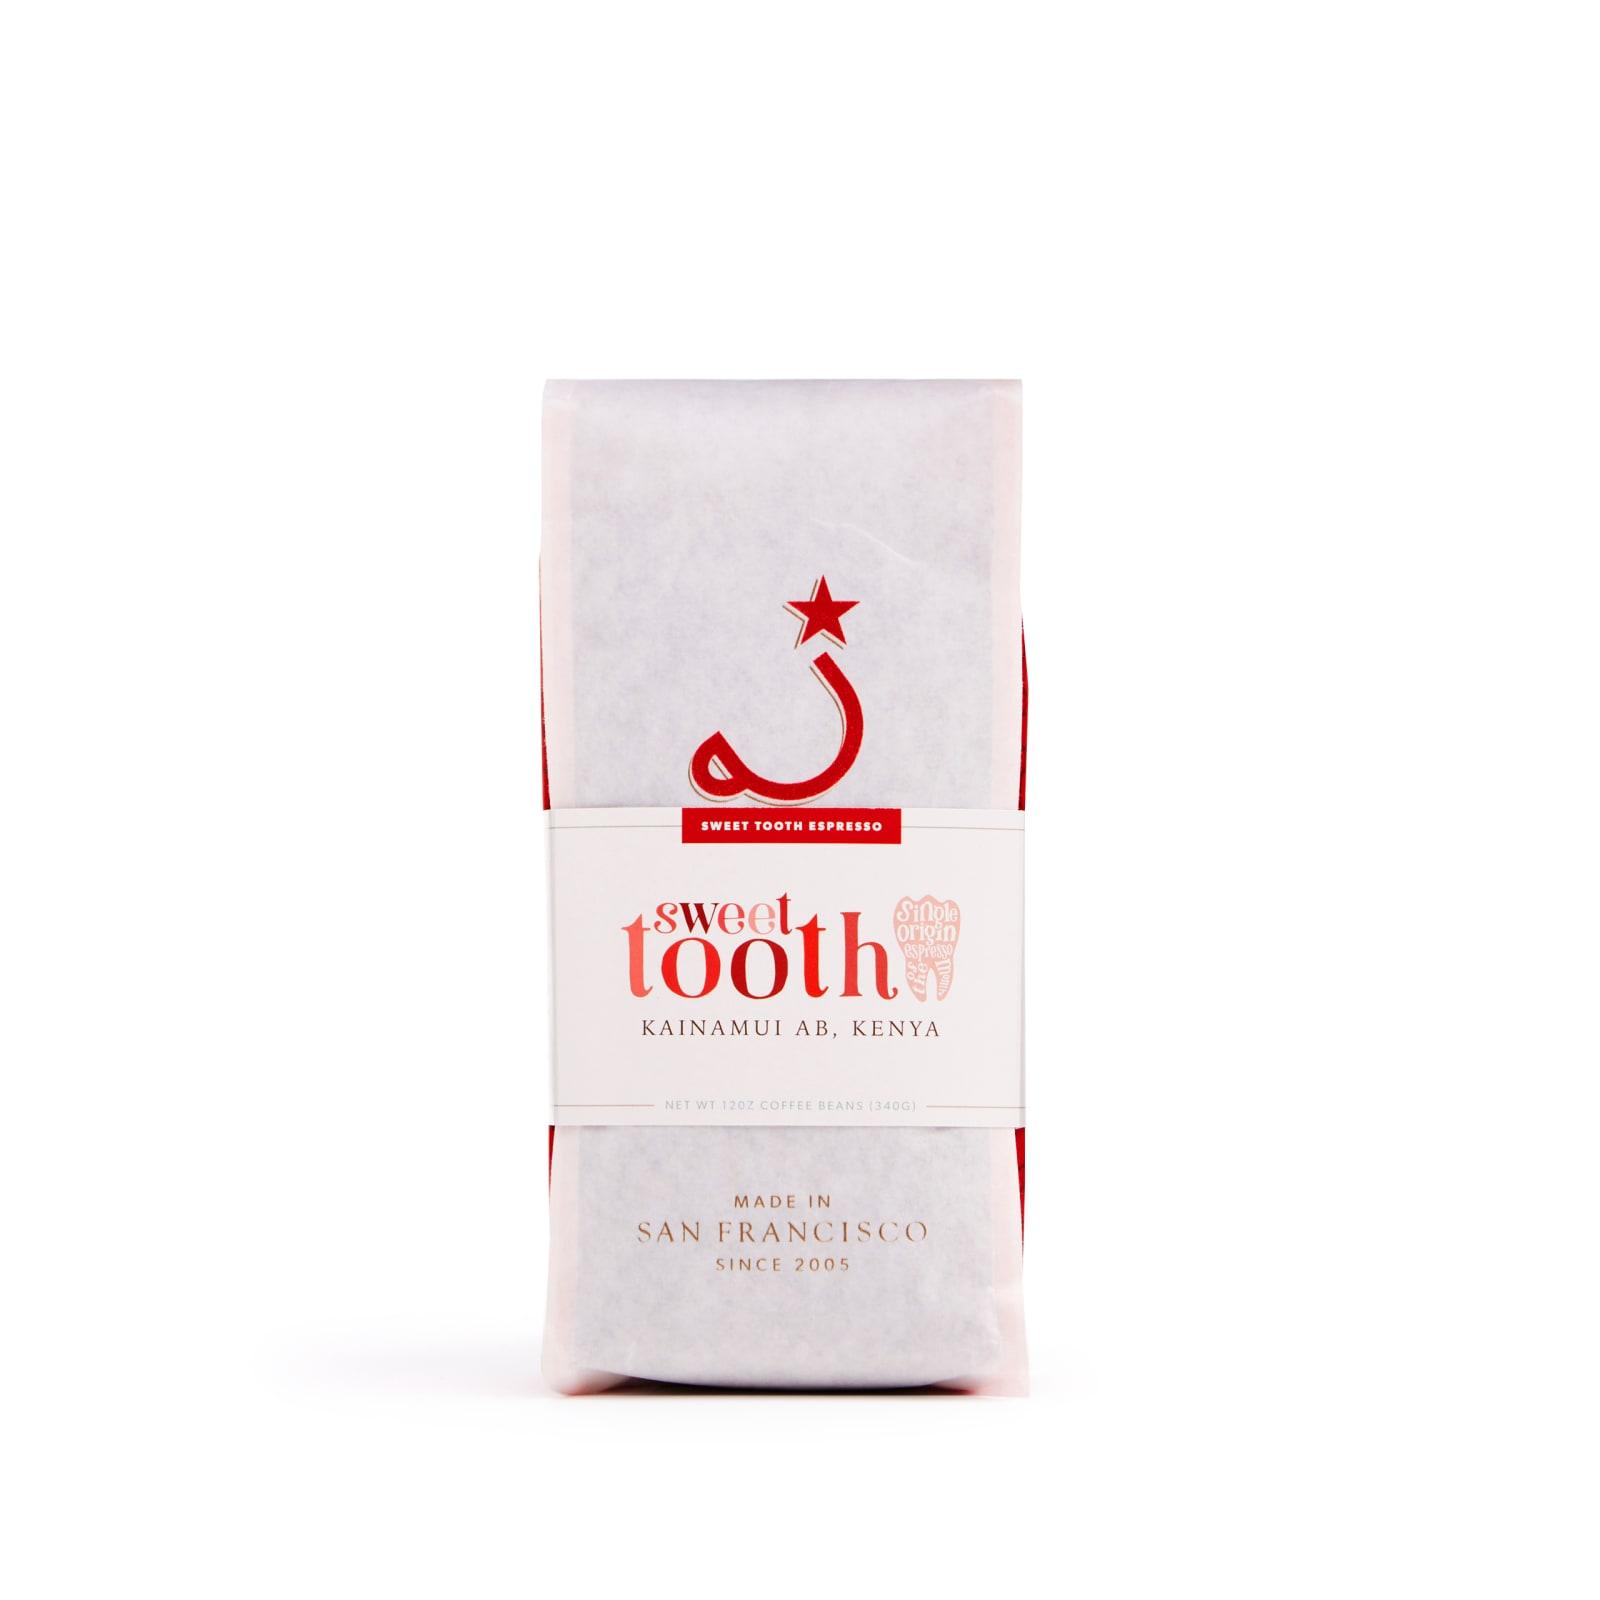 Sweet Tooth Kainamui, Kenya